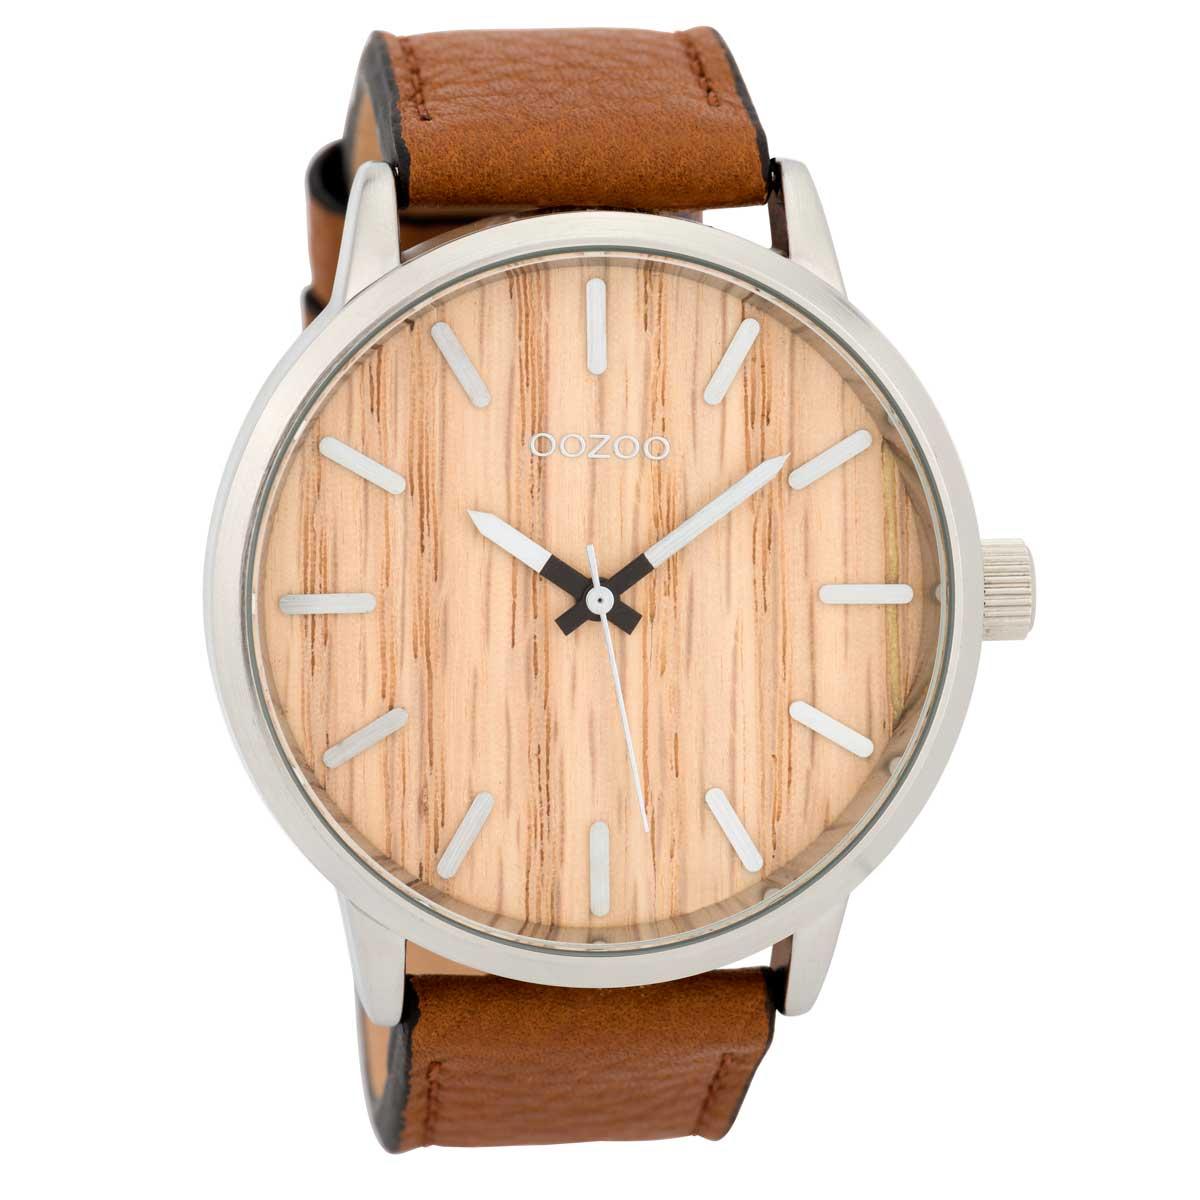 OOZOO Timepieces C9256 ανδρικό ρολόι XL με ασημί μεταλλική κάσα ... bc6bd2b6e17